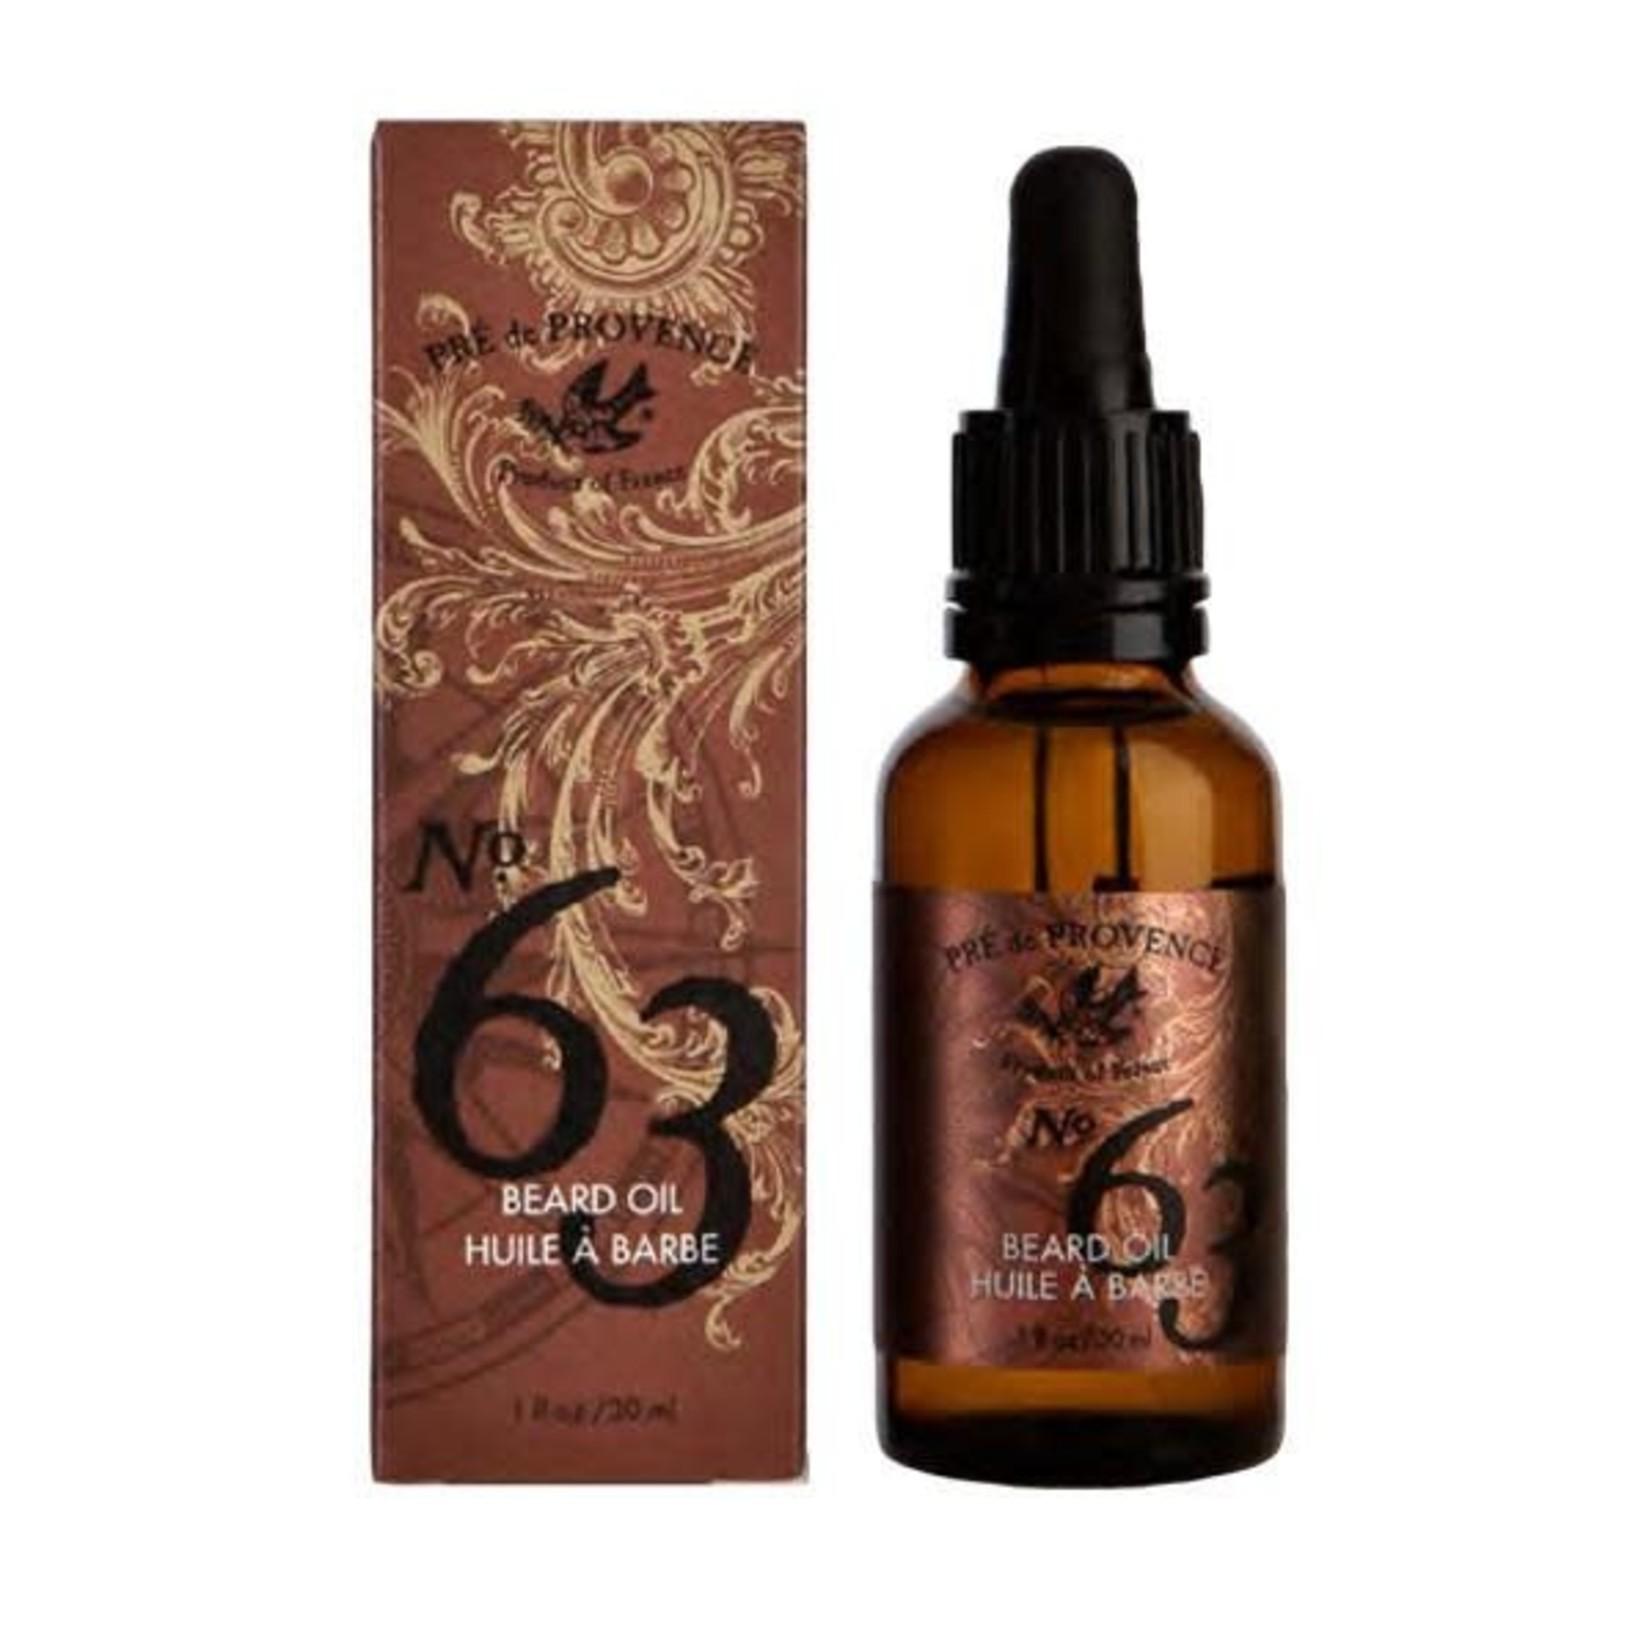 No. 63 - Beard Oil